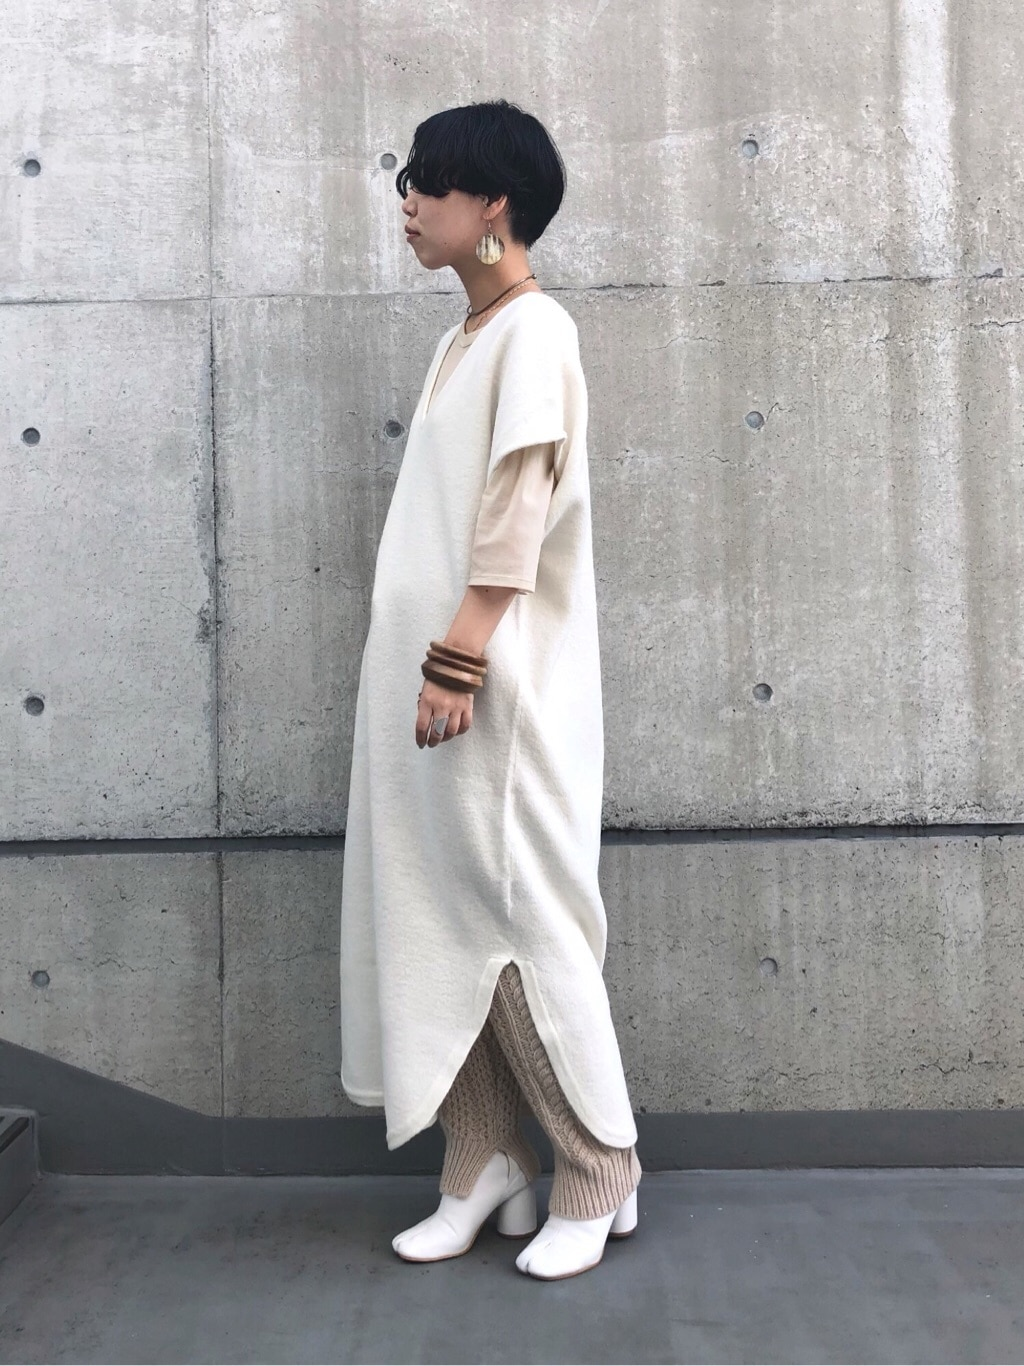 note et silence. ルミネ新宿 身長:160cm 2019.10.09